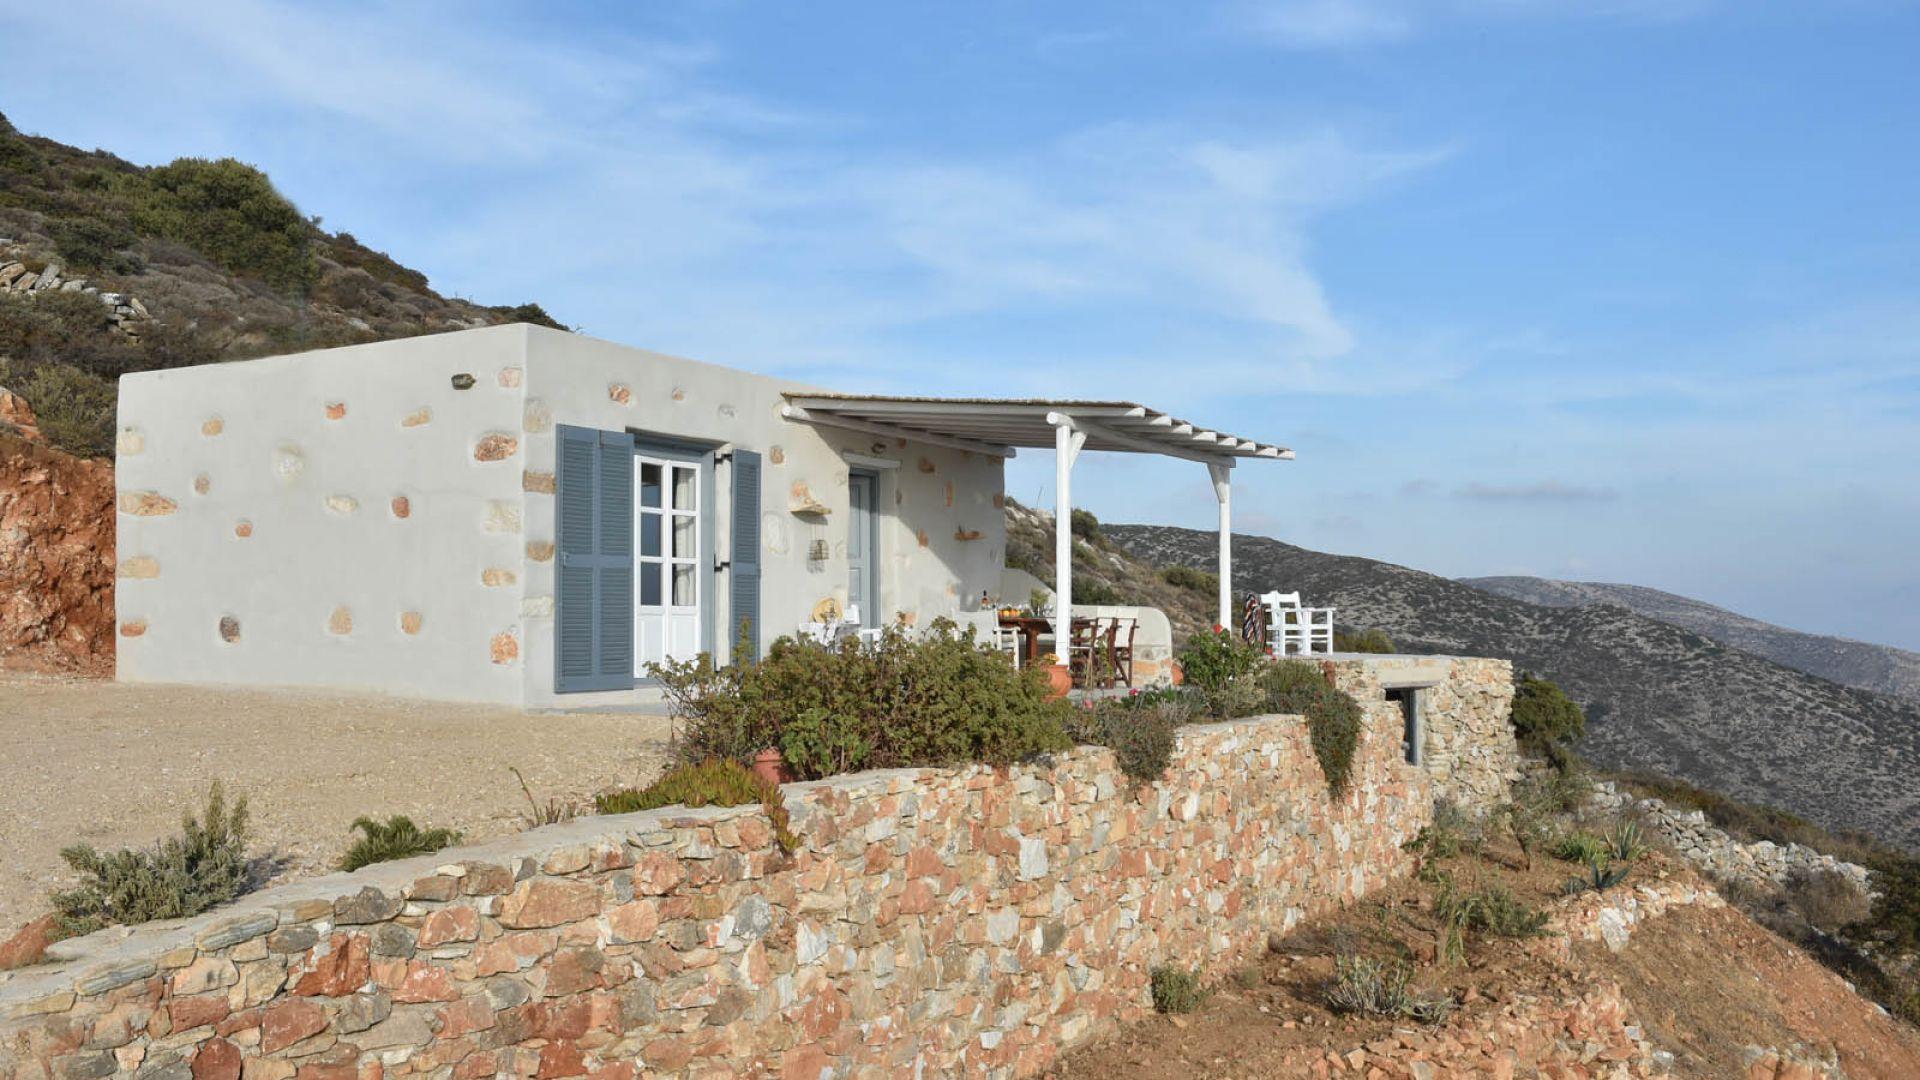 Eagle S Nest Agkeria Agioi Theodori Apartments In Paros